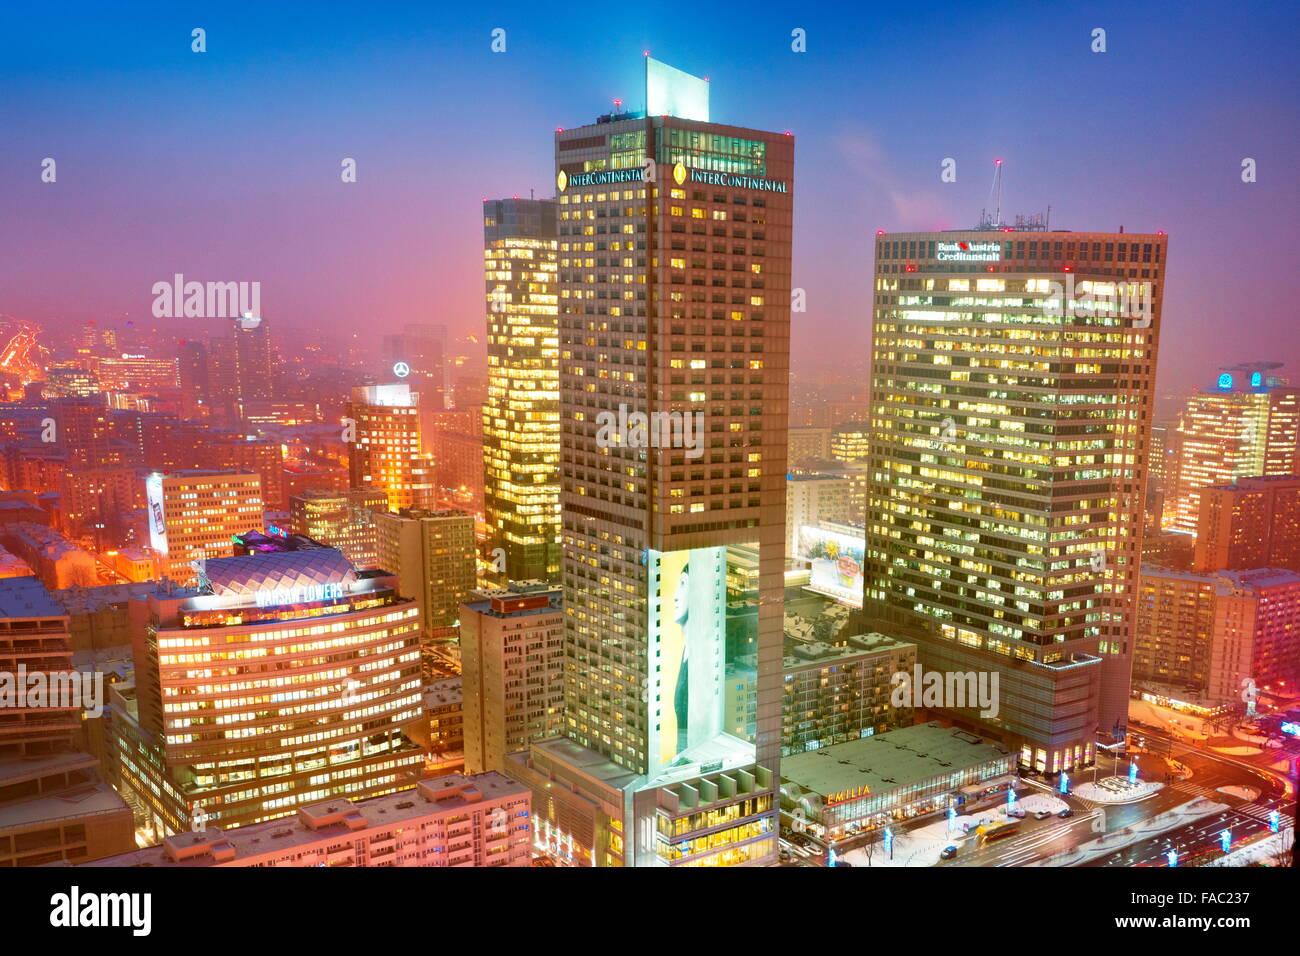 Moderno distrito de Varsovia, Polonia skyline Imagen De Stock